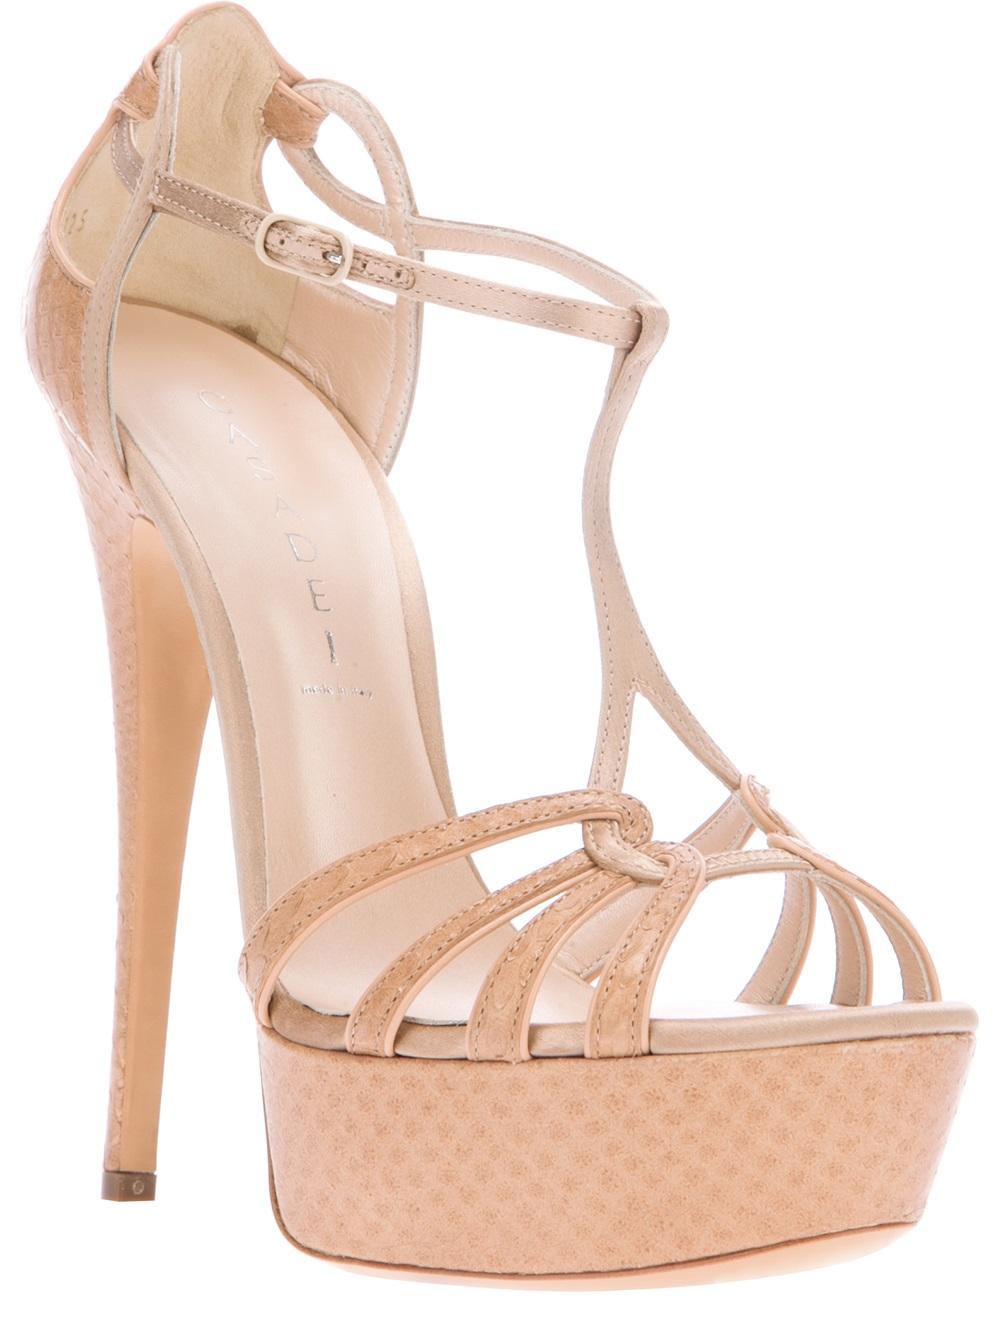 buy cheap 2015 new for sale Casadei Platform Cage Sandals NPkZLBUe